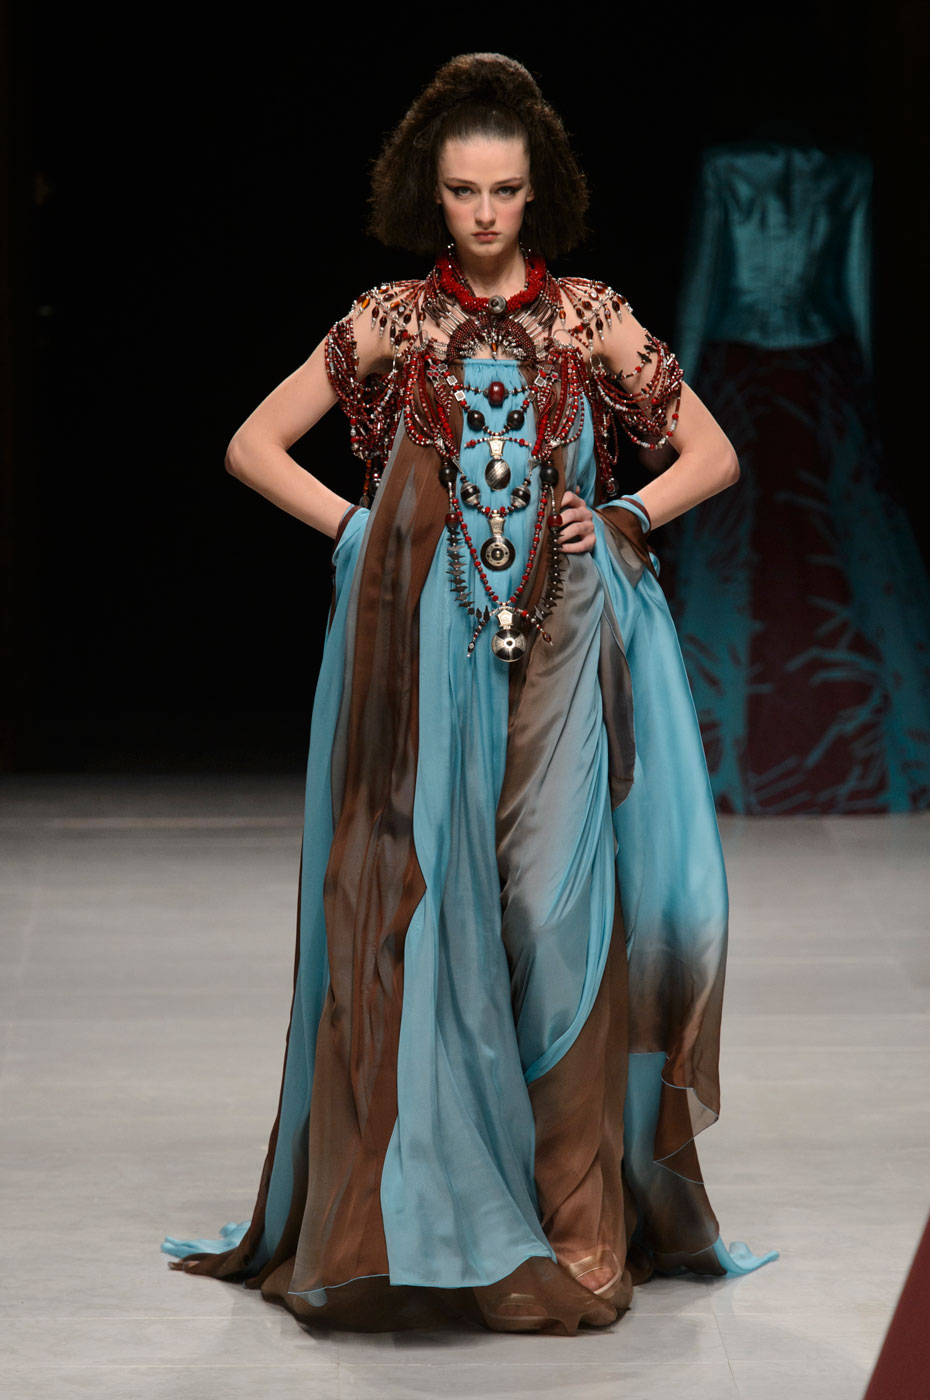 Julien-Fournie-Prive-fashion-runway-show-haute-couture-paris-spring-2015-the-impression-50